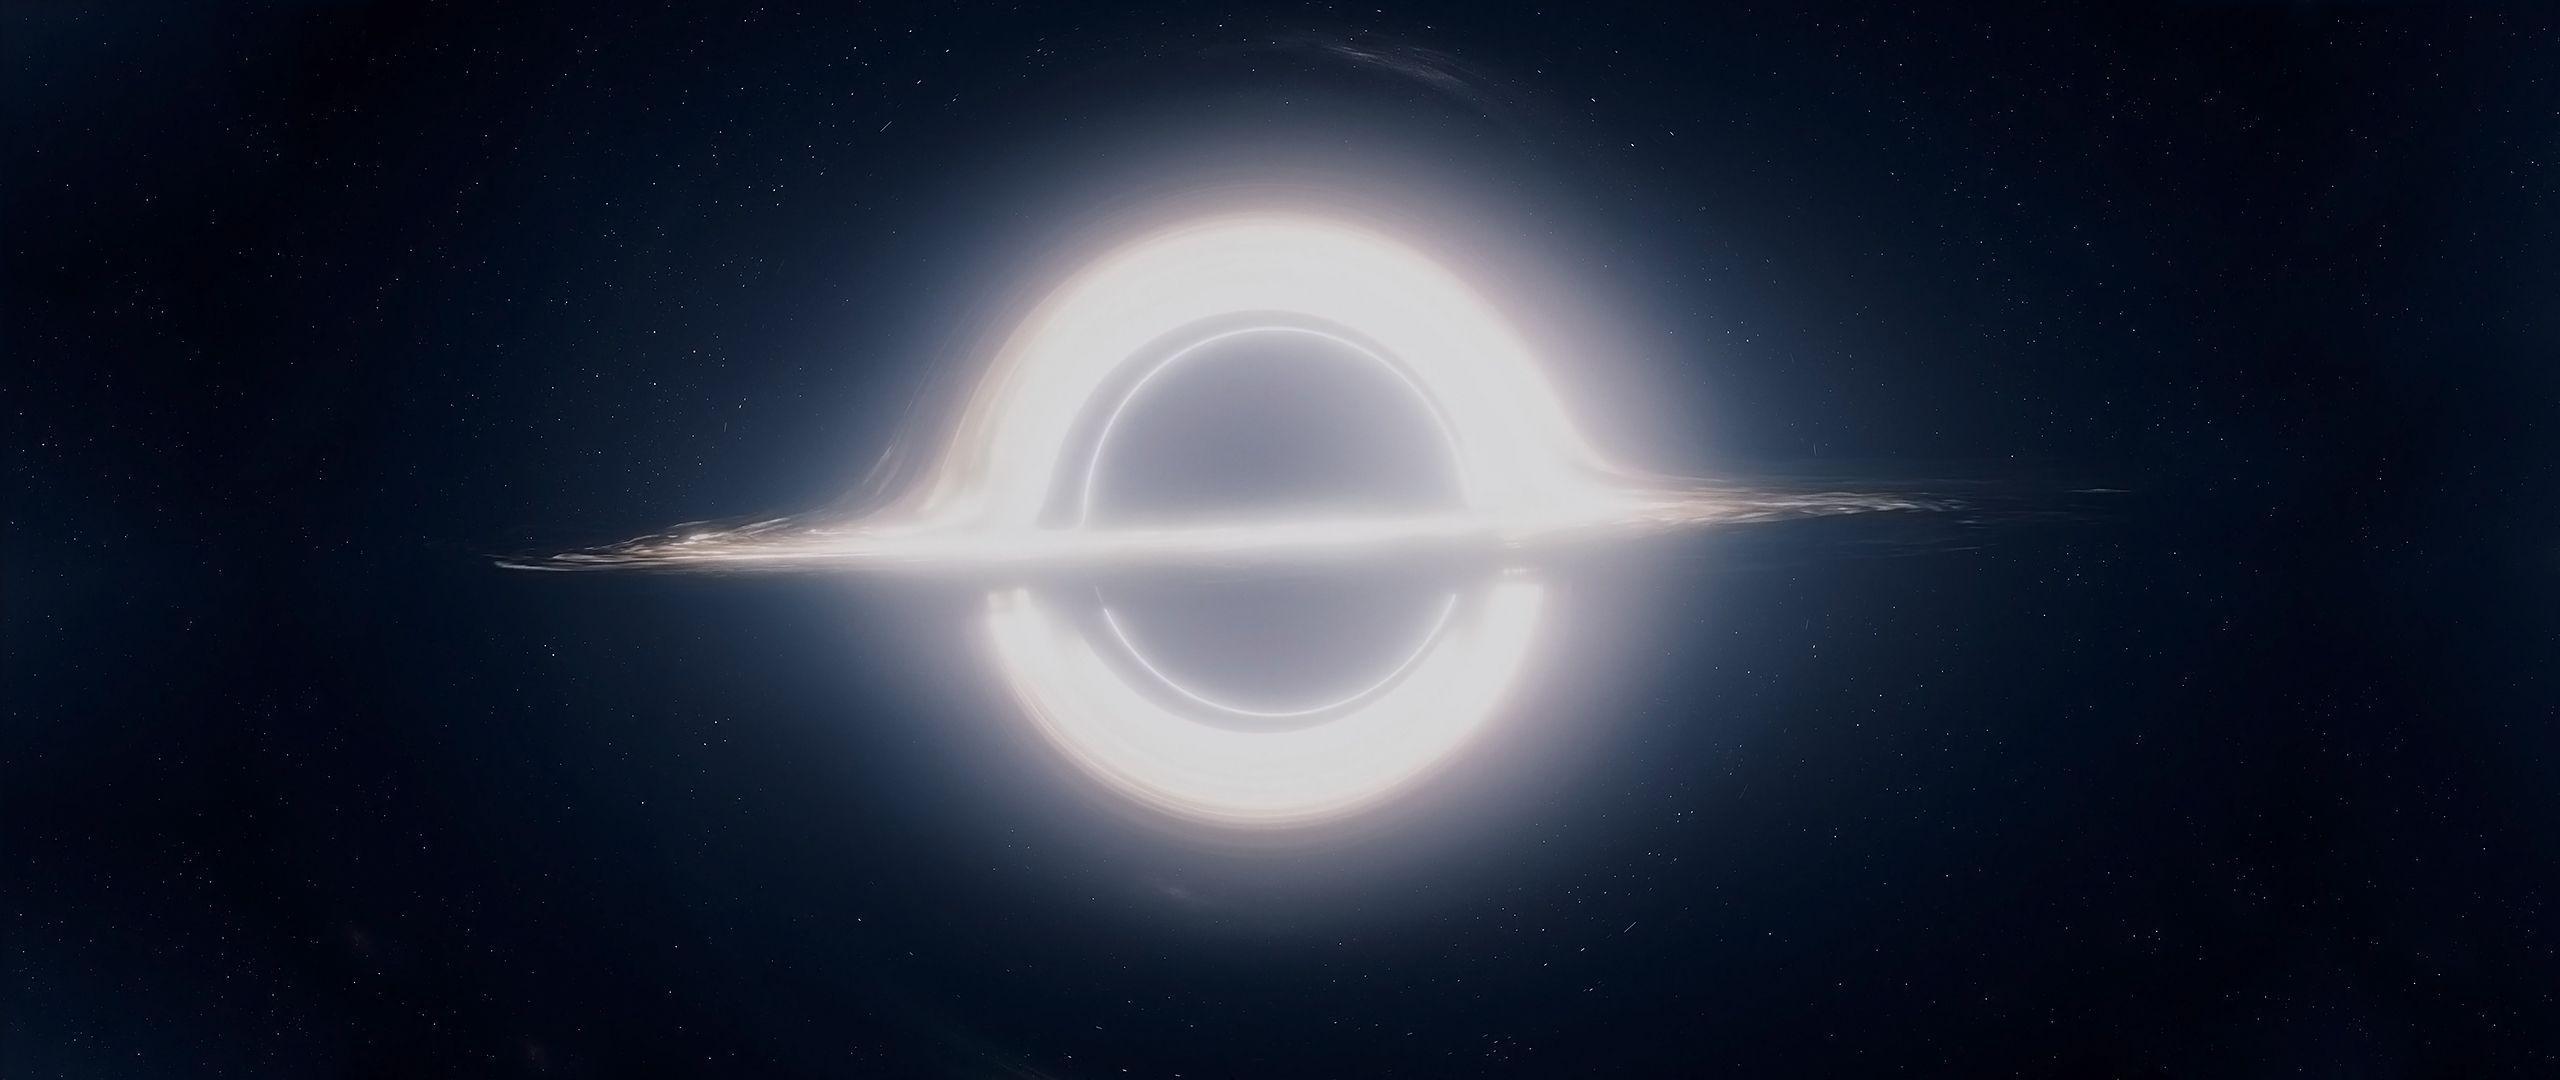 black hole 480x800 - photo #8